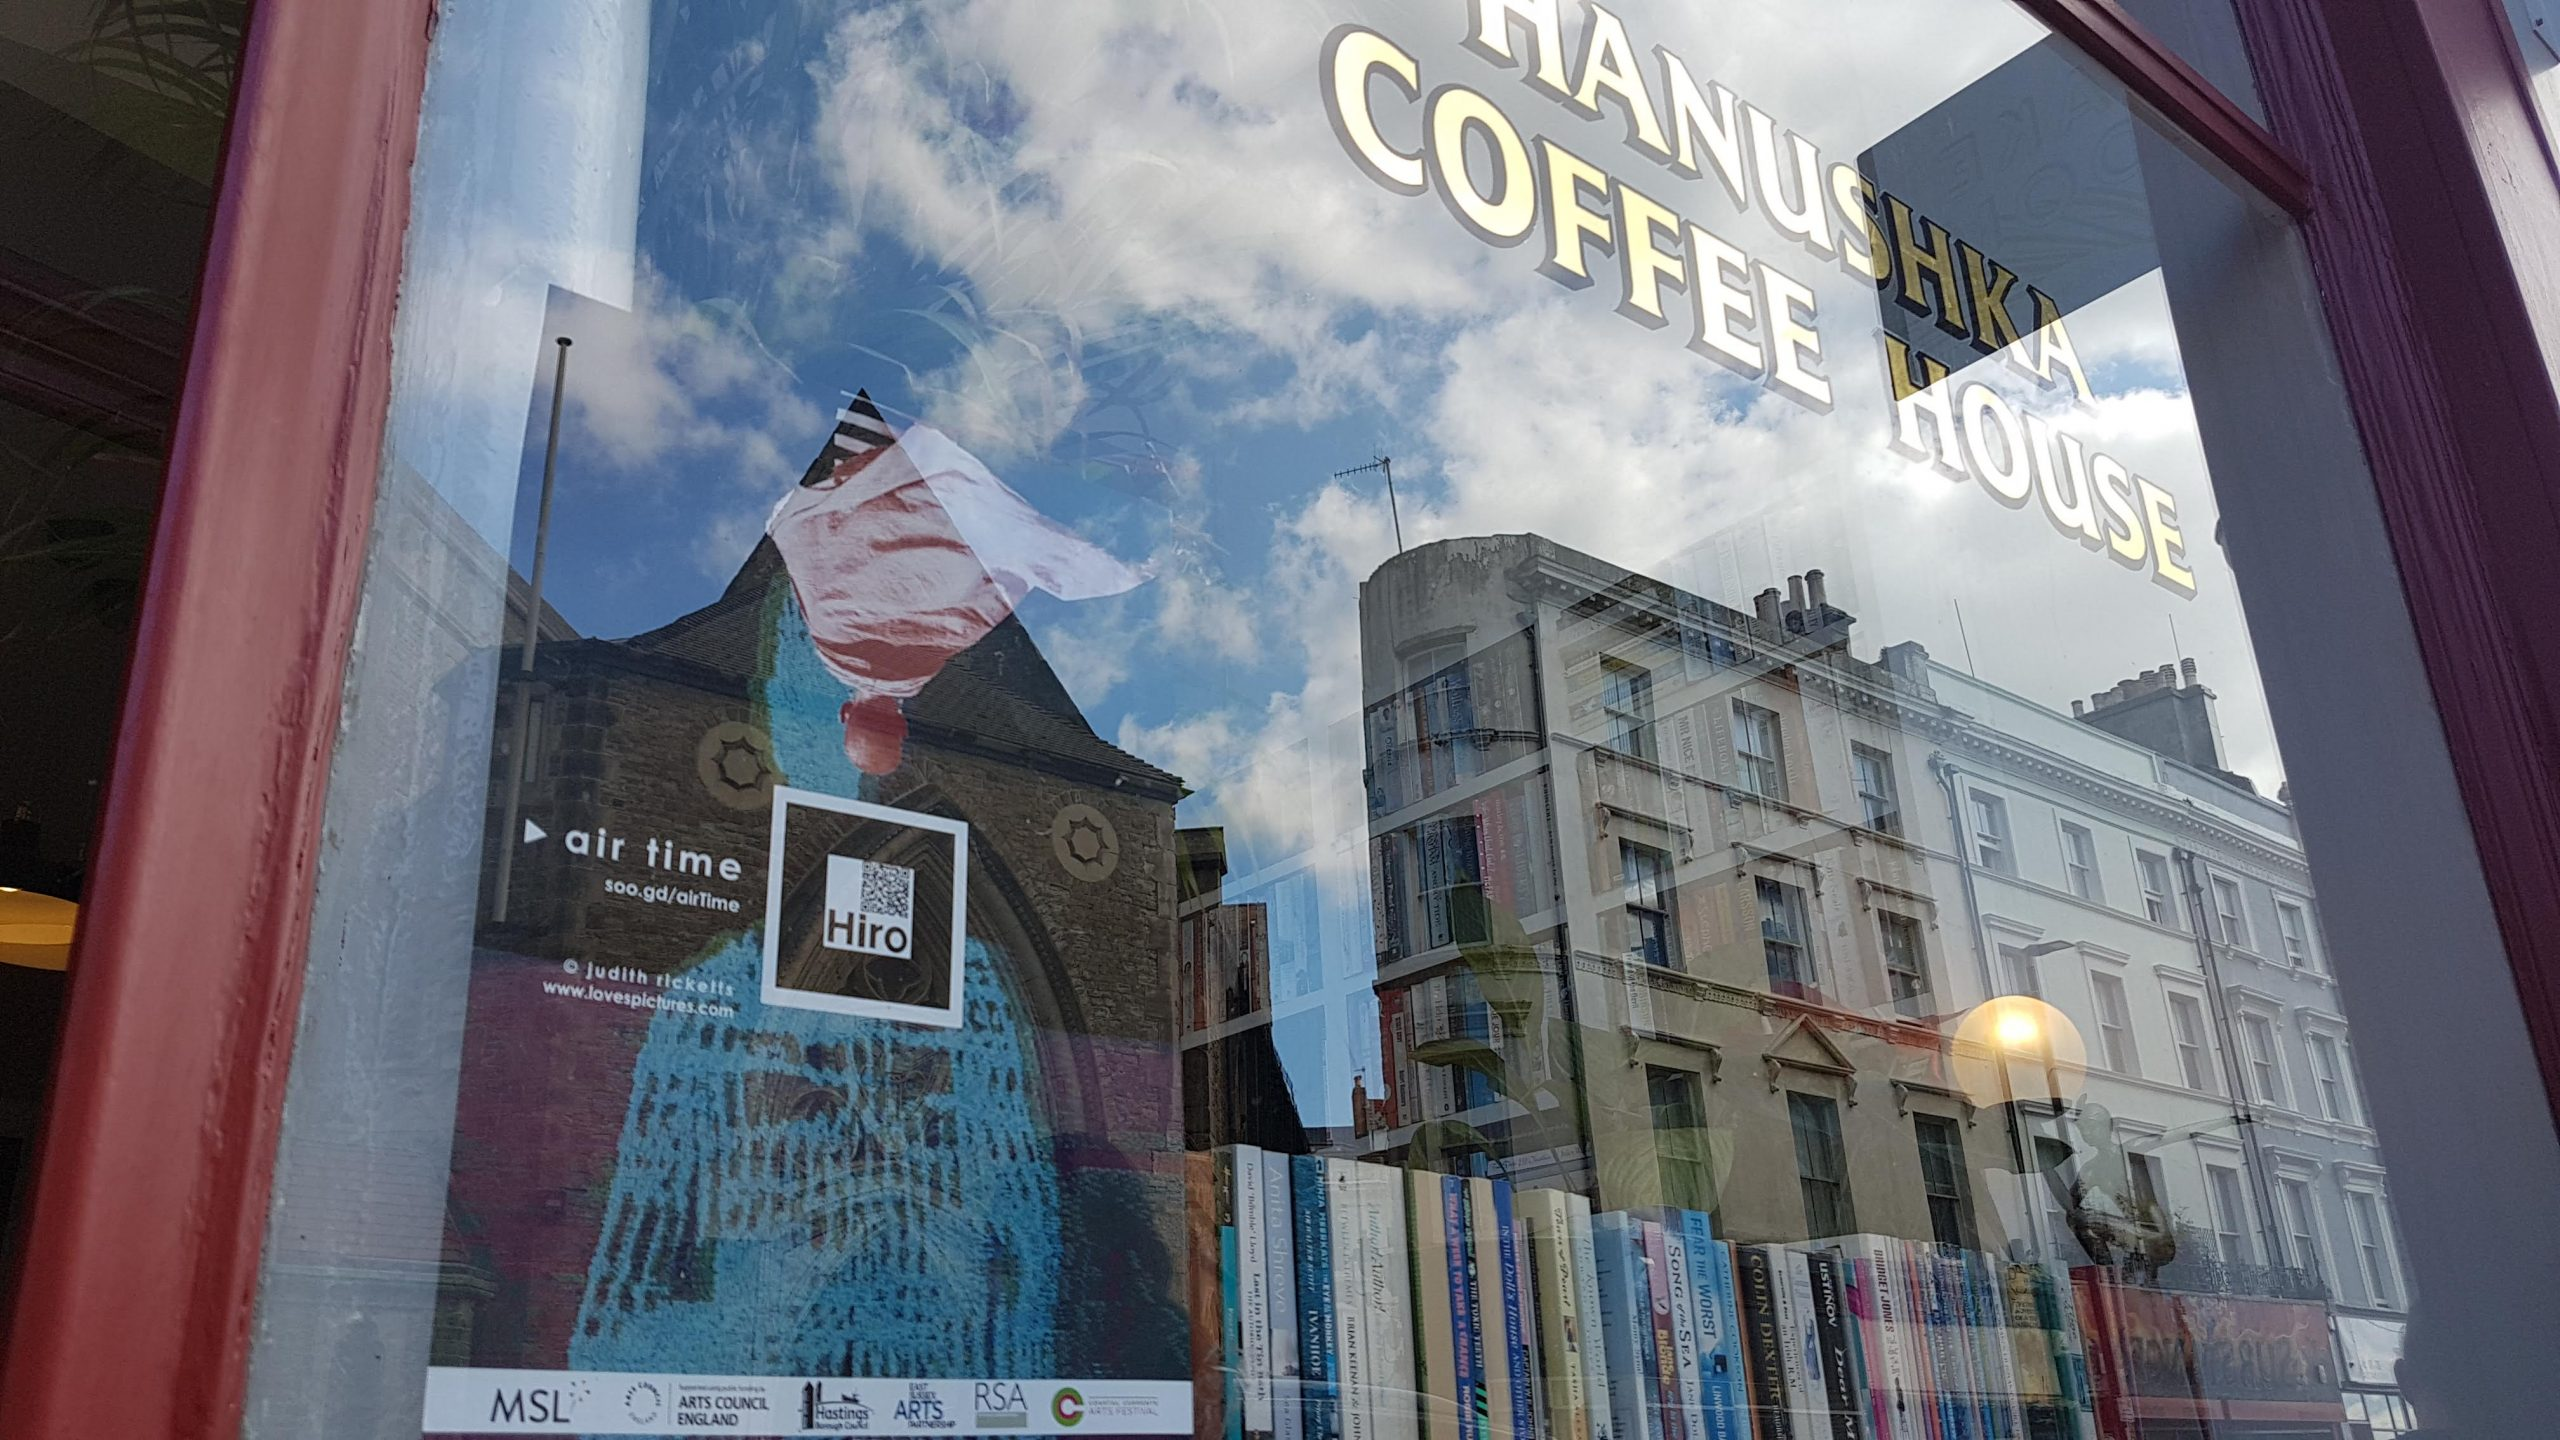 Air Time poster in Hanushka Coffe House window Hastings